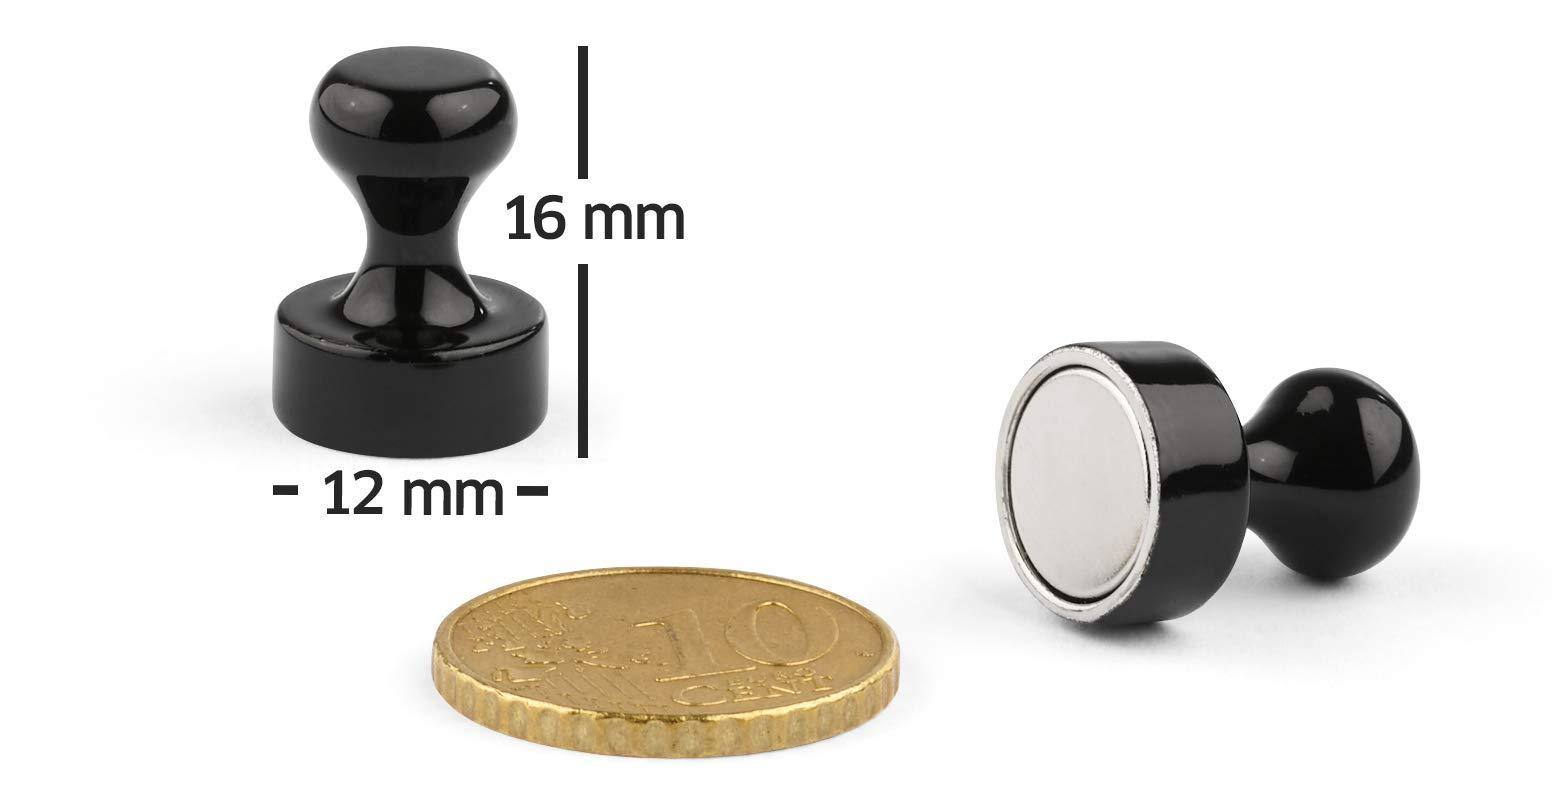 Smart House Tools Magnethaken 4 St/ück Starke Neodym Haken-Magnete /Ø 25x45 mm Haftkraft 22 kg